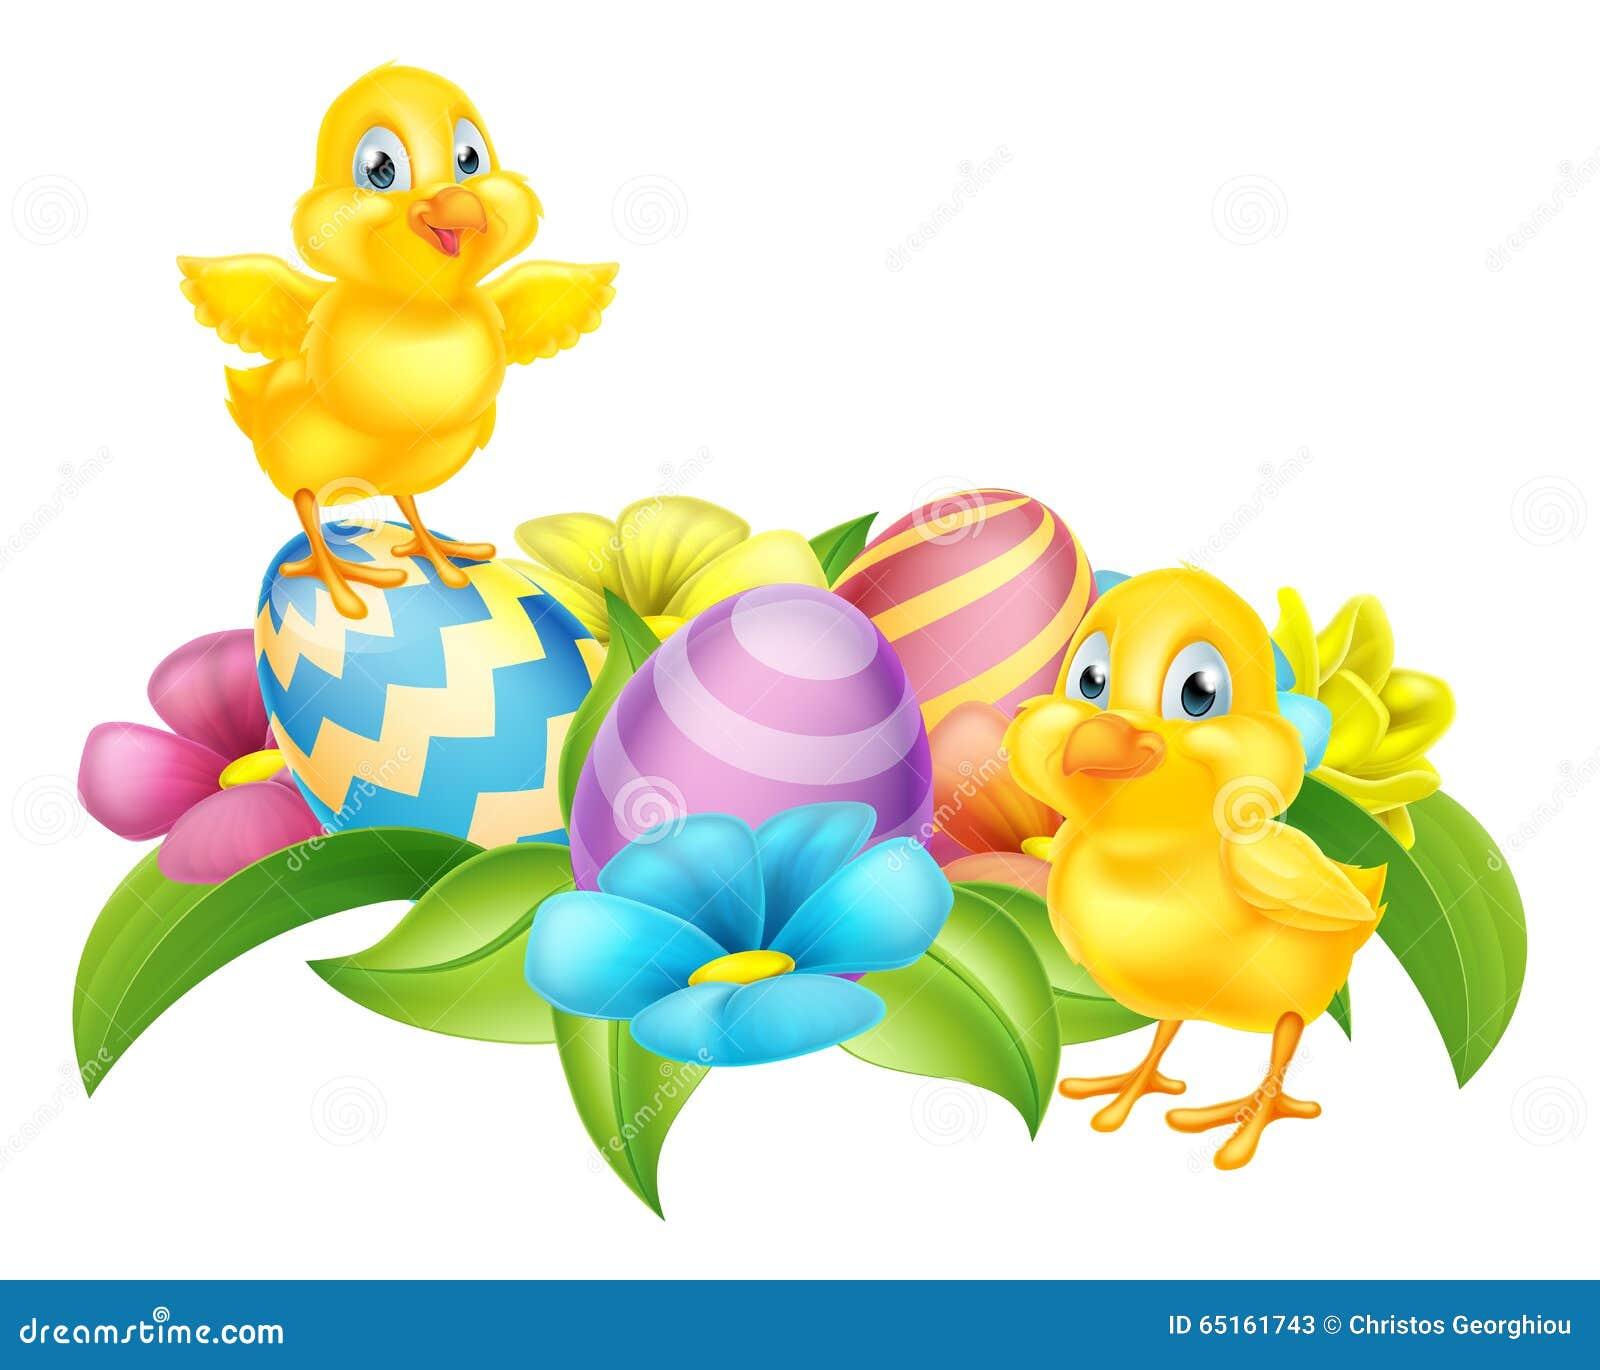 Cartoon Chicks And Easter Eggs Stock Vector Illustration Of Bird